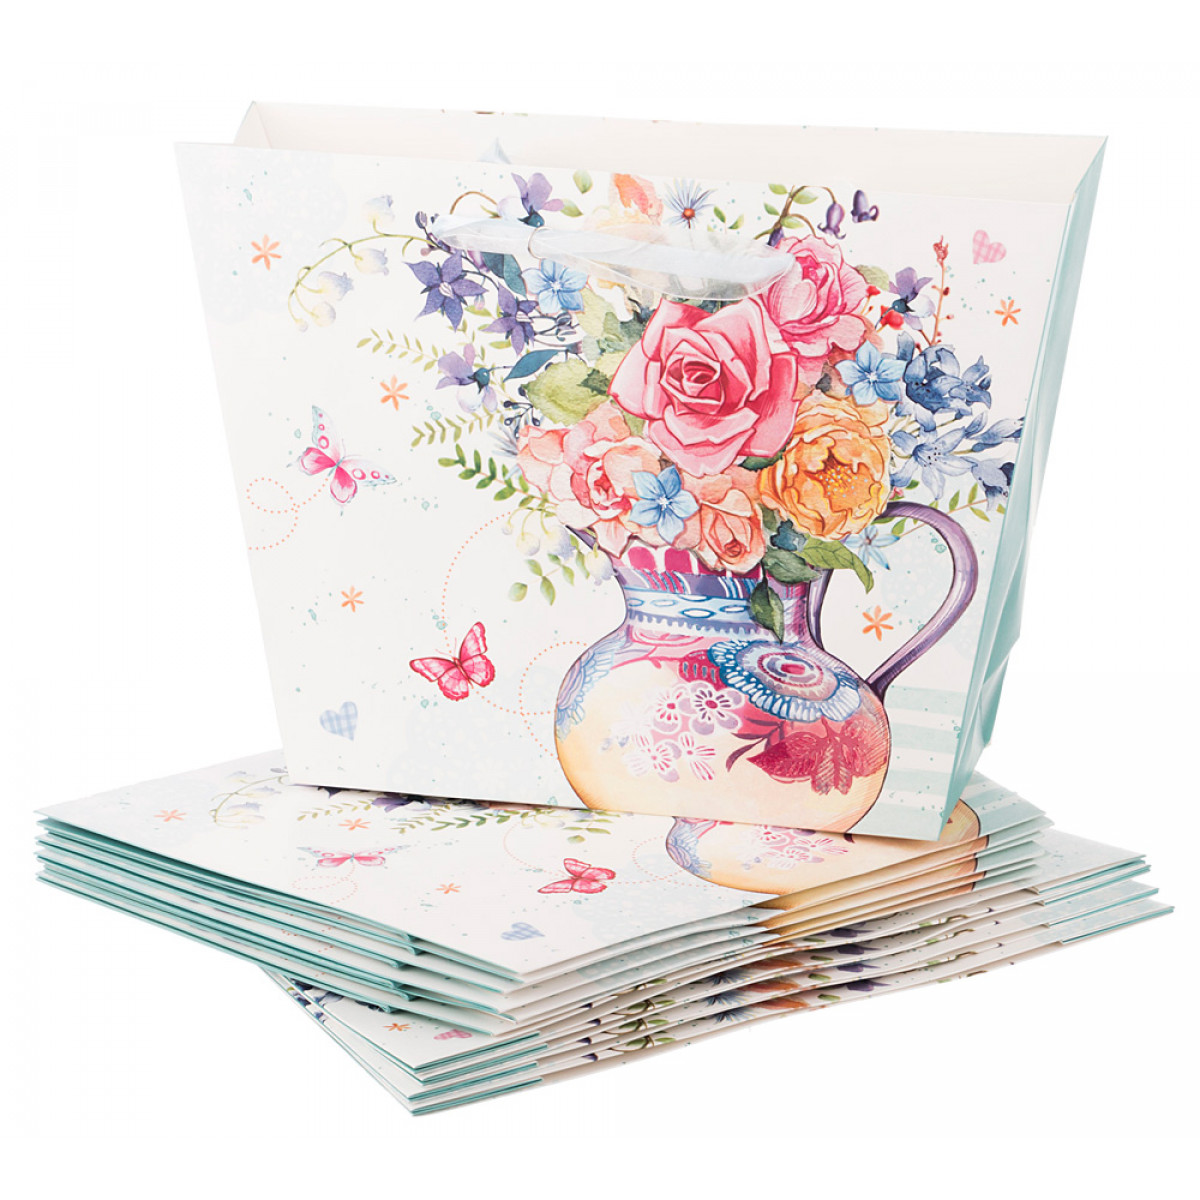 {} Lefard Пакет подарочный Natalie (10х23х32 см - 10 шт) natalie merchant natalie merchant paradise is there the new tigerlily recordings 2 lp